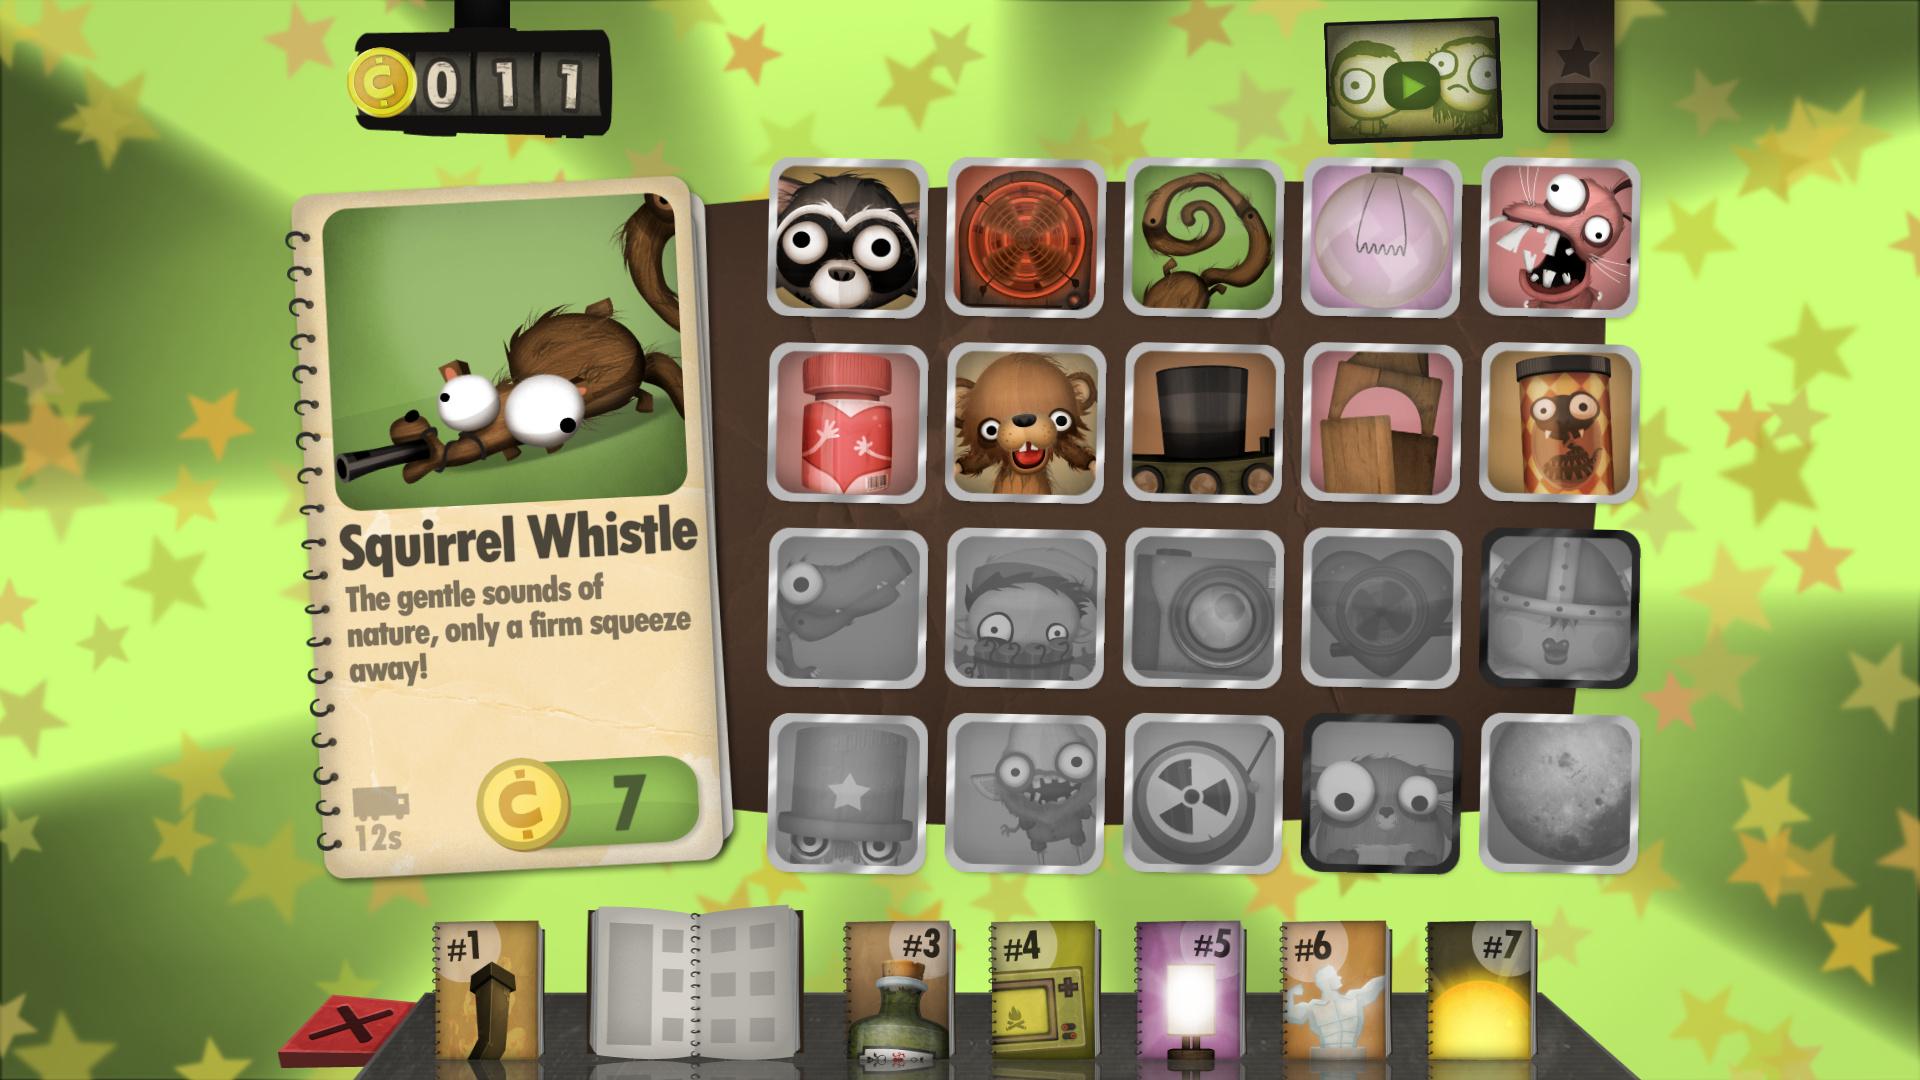 http://images.nintendolife.com/screenshots/44127/large.jpg